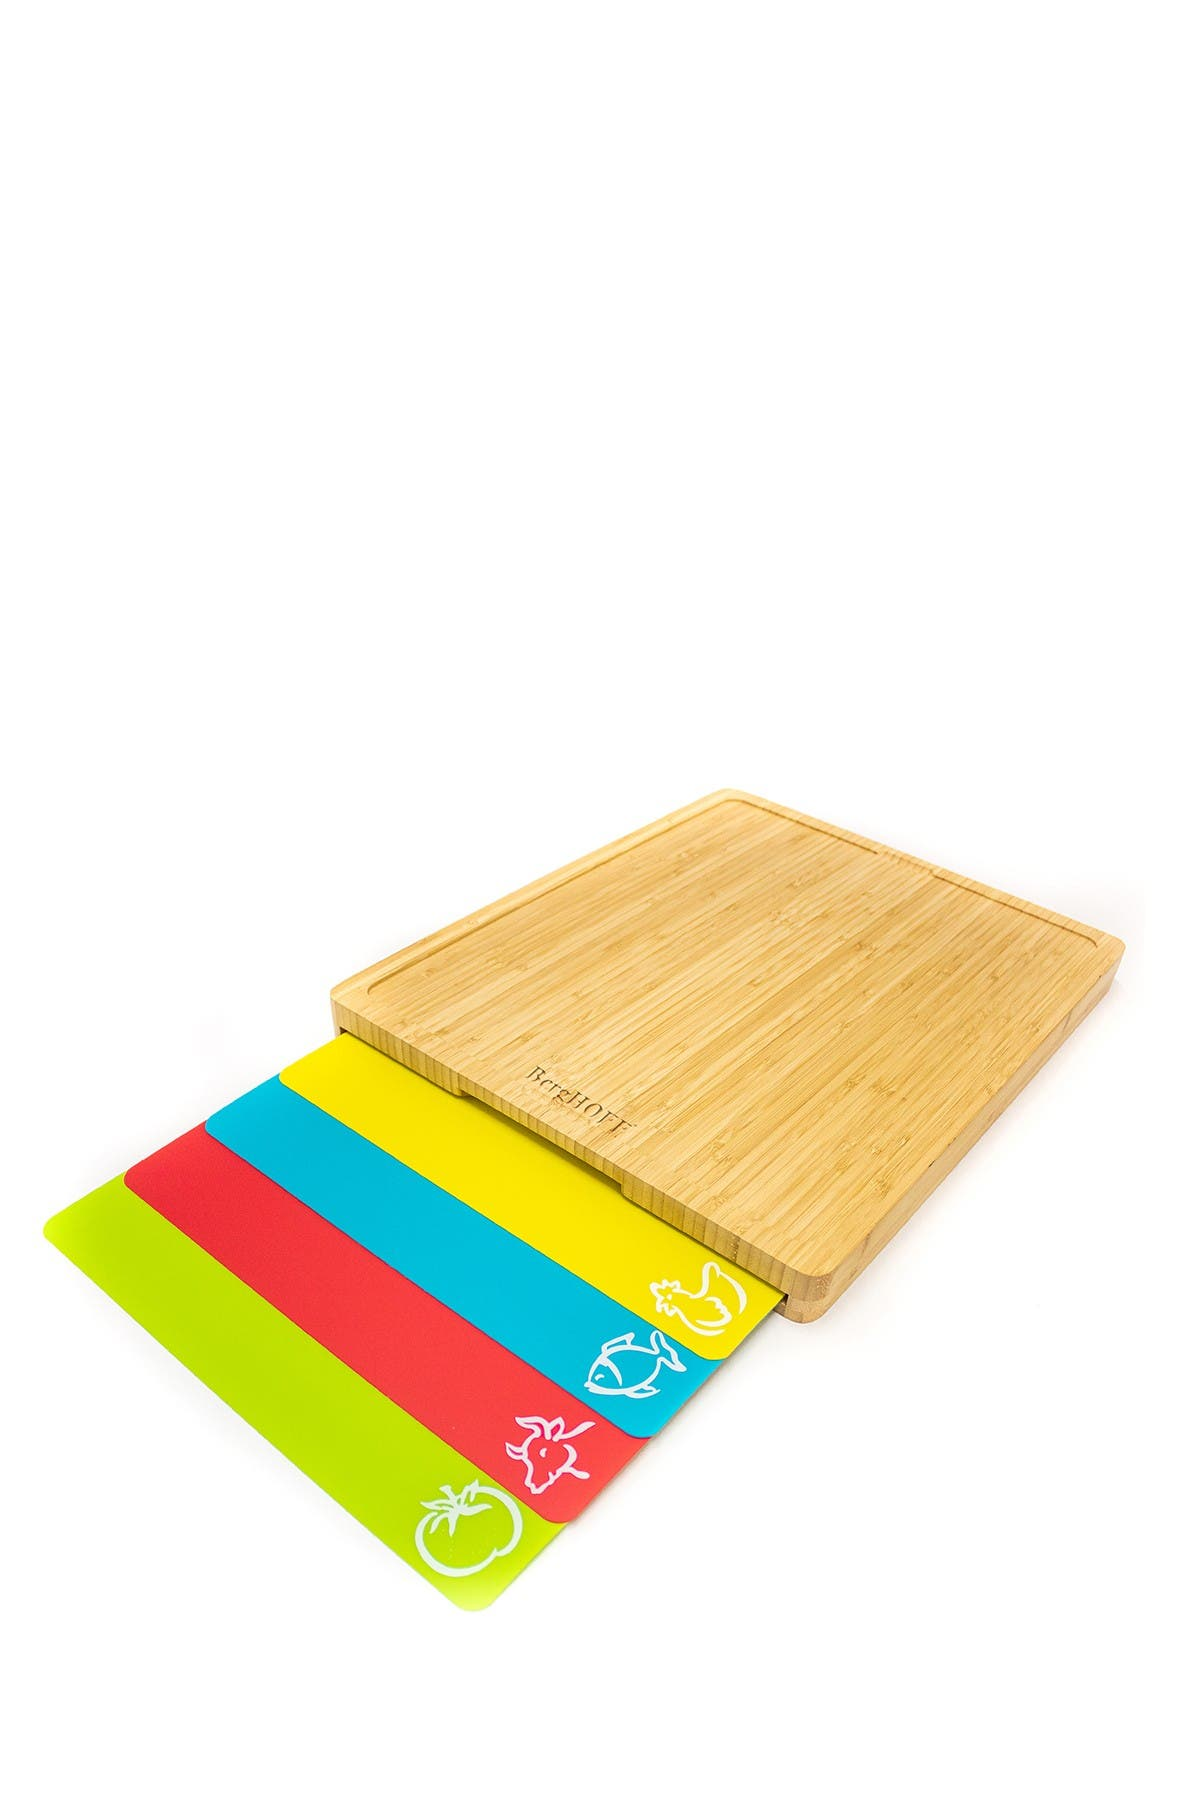 Image of BergHOFF Bamboo 5-Piece Cutting Board Set